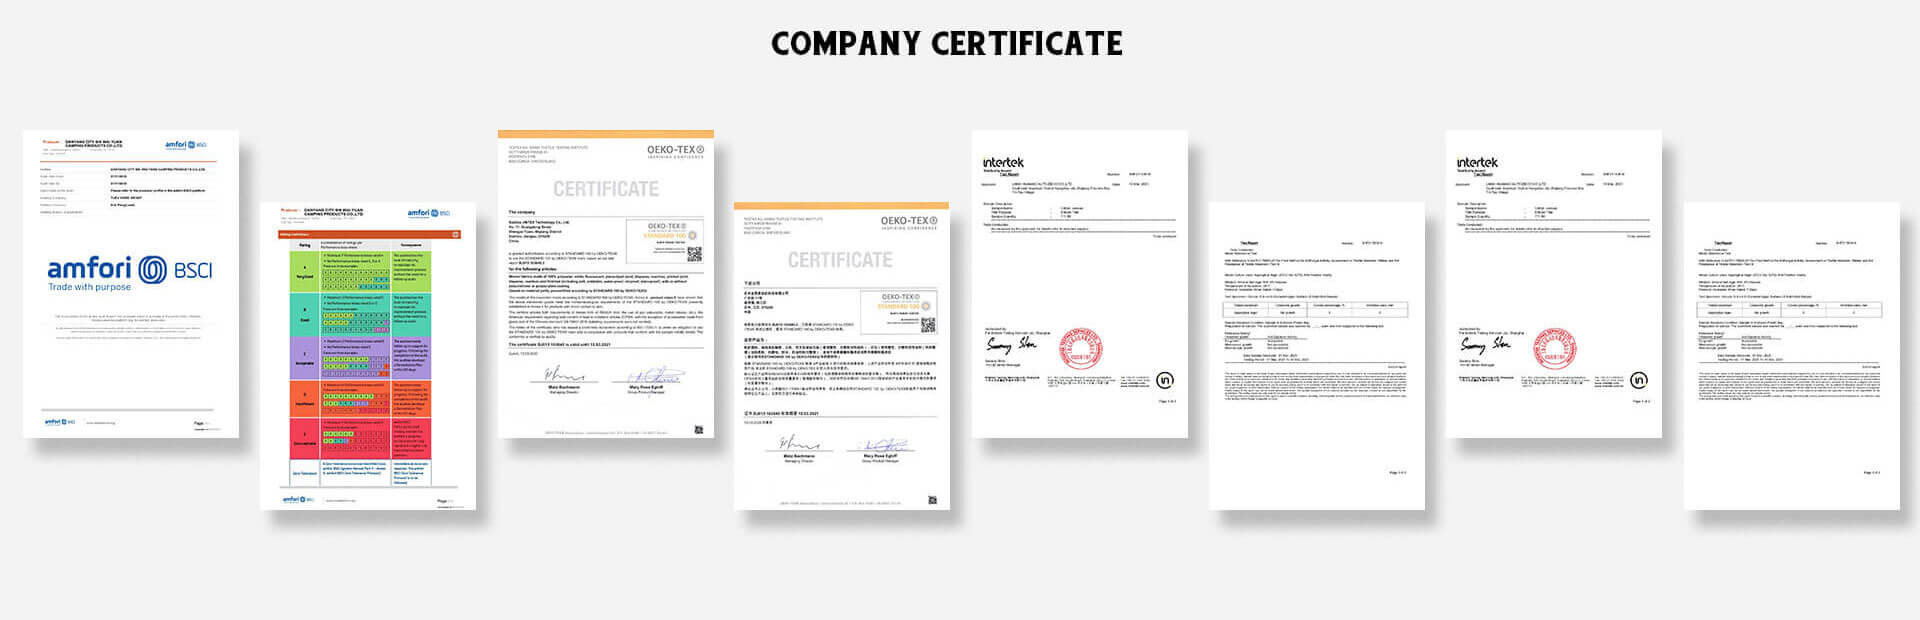 everich-outdoor-certificate